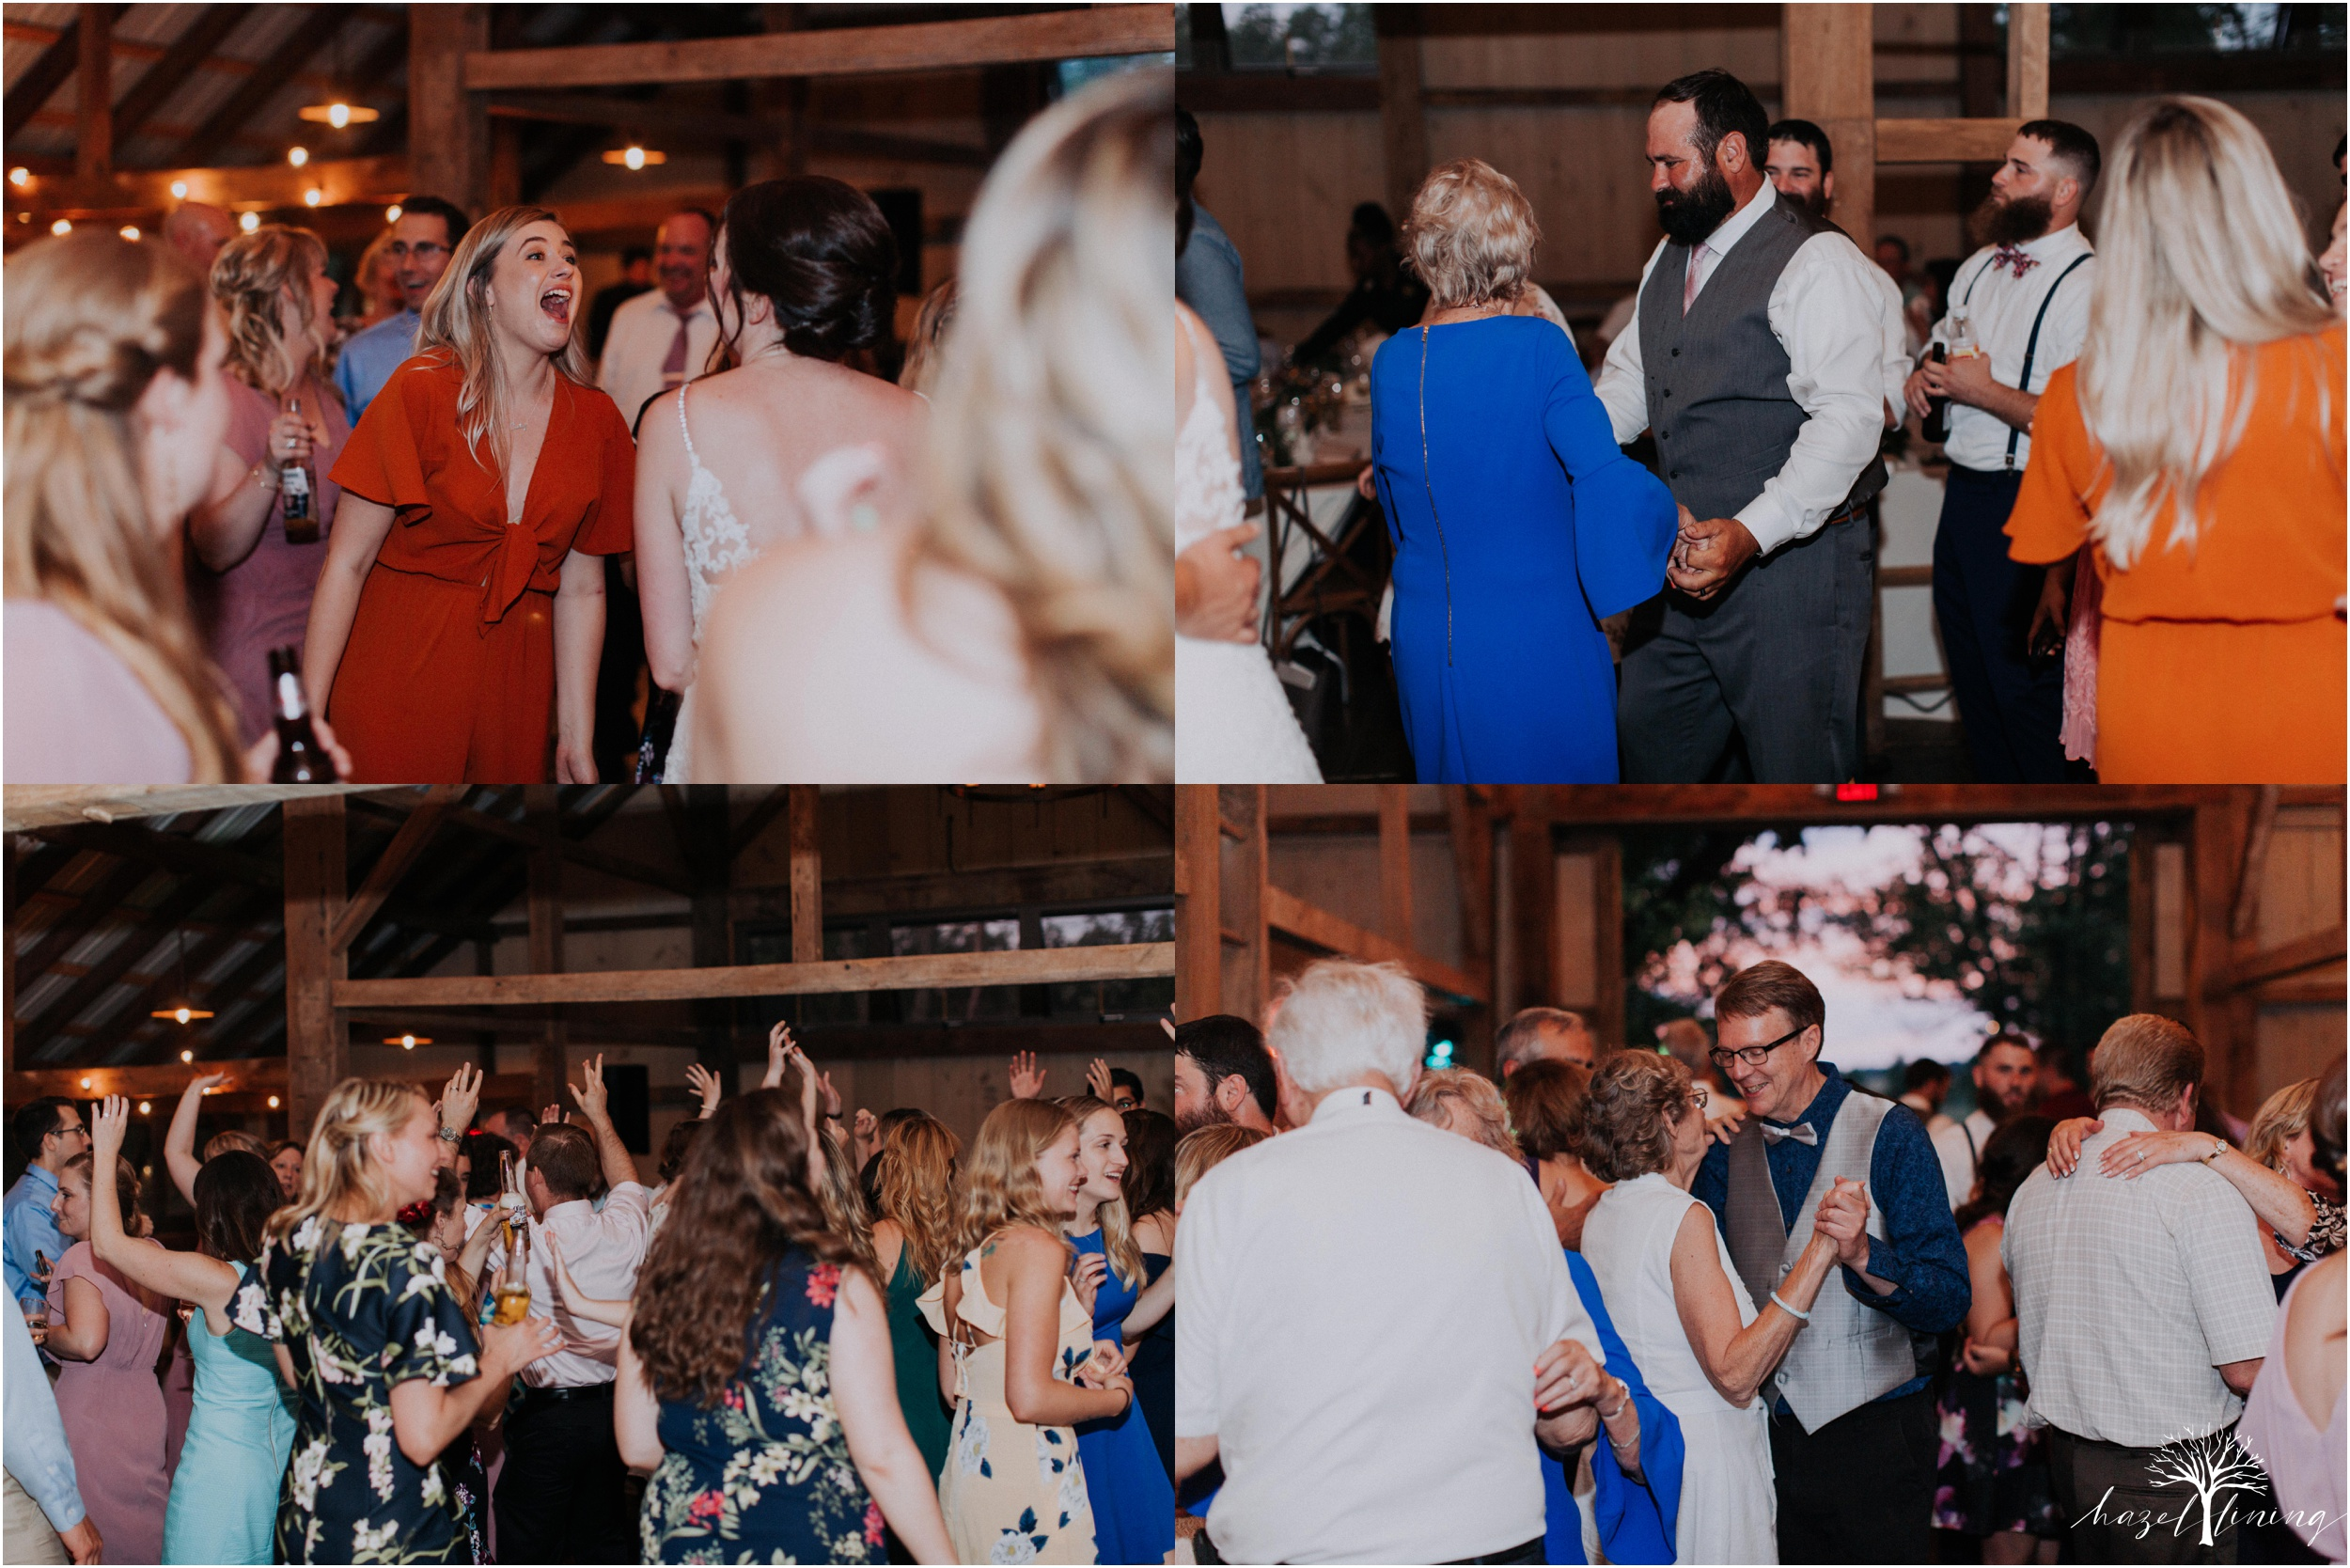 hazel-lining-travel-wedding-elopement-photography-lisa-landon-shoemaker-the-farm-bakery-and-events-bucks-county-quakertown-pennsylvania-summer-country-outdoor-farm-wedding_0160.jpg